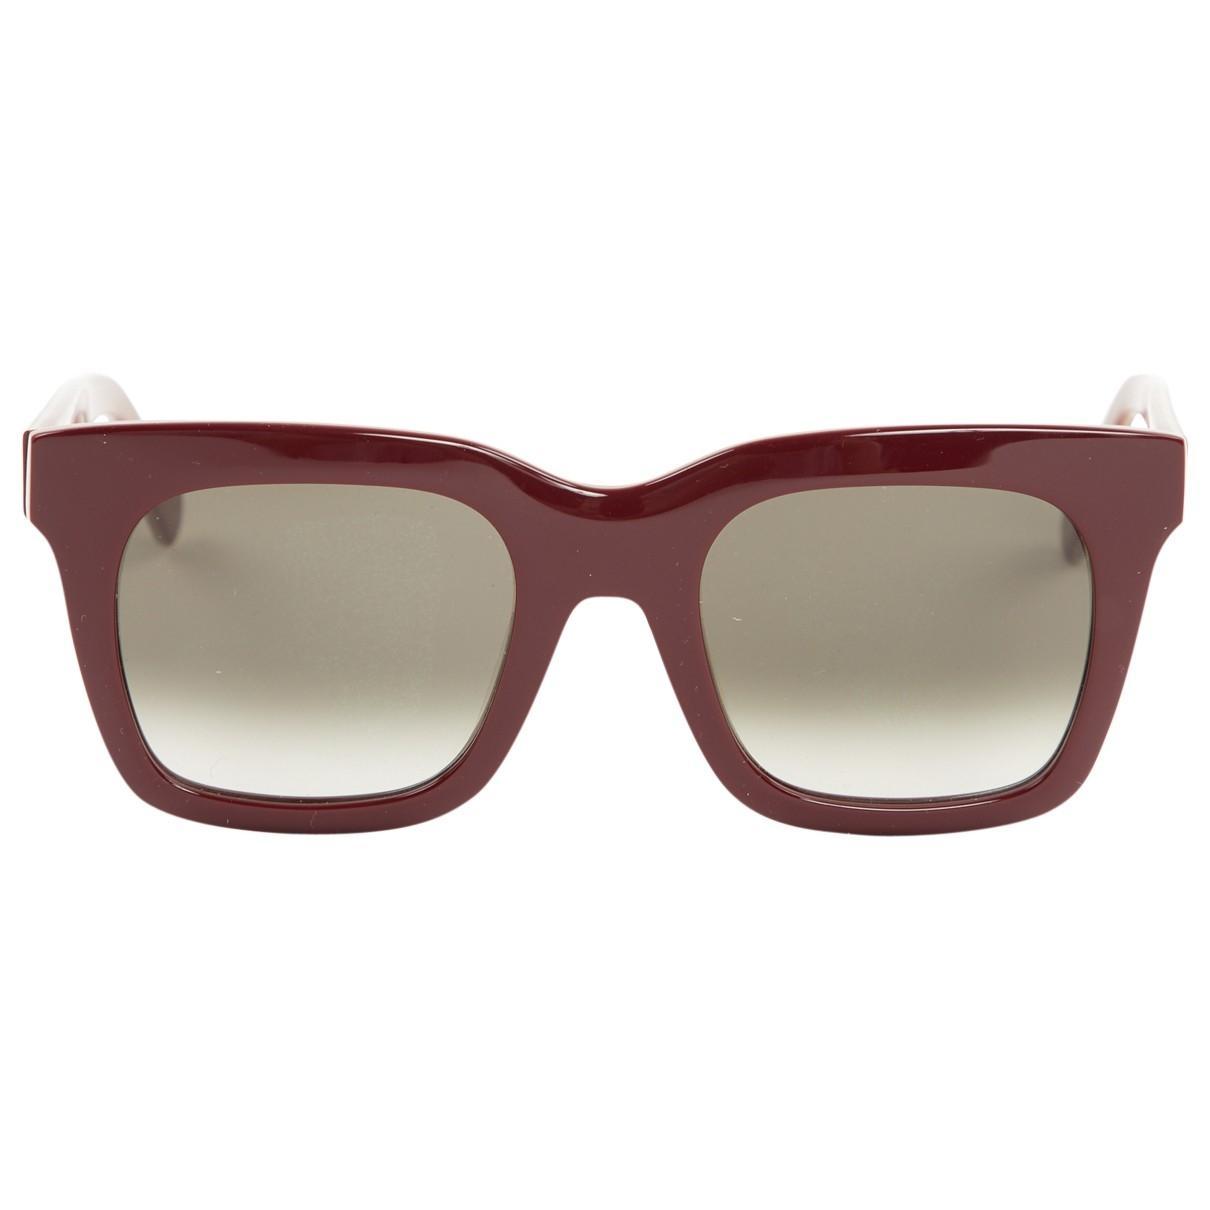 6bee6071b2264 Céline. Women s Luca Burgundy Plastic Sunglasses. £203 From Vestiaire  Collective